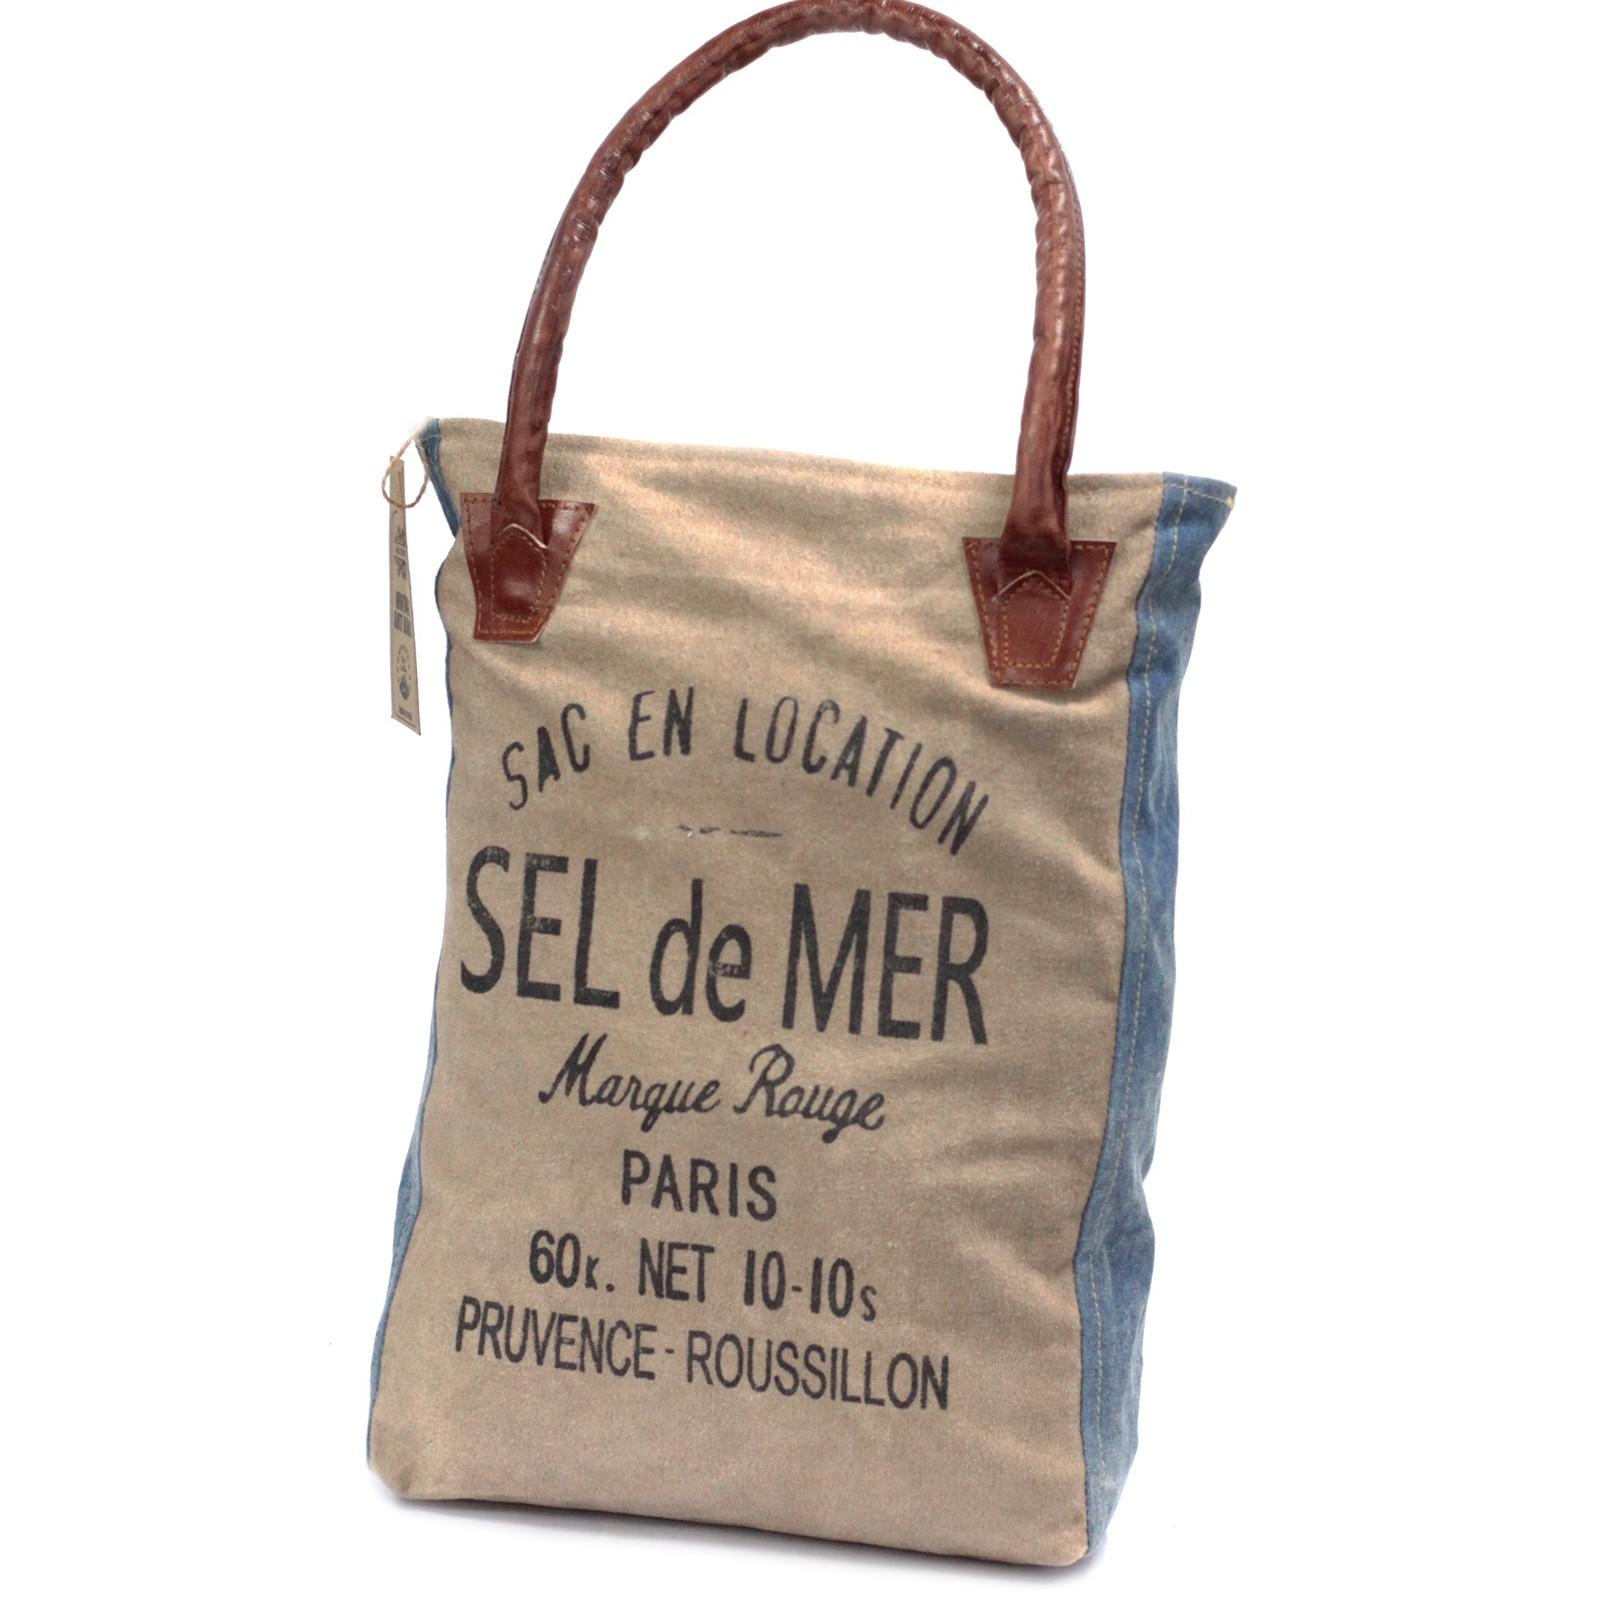 Vintage Bag - Sac en Location